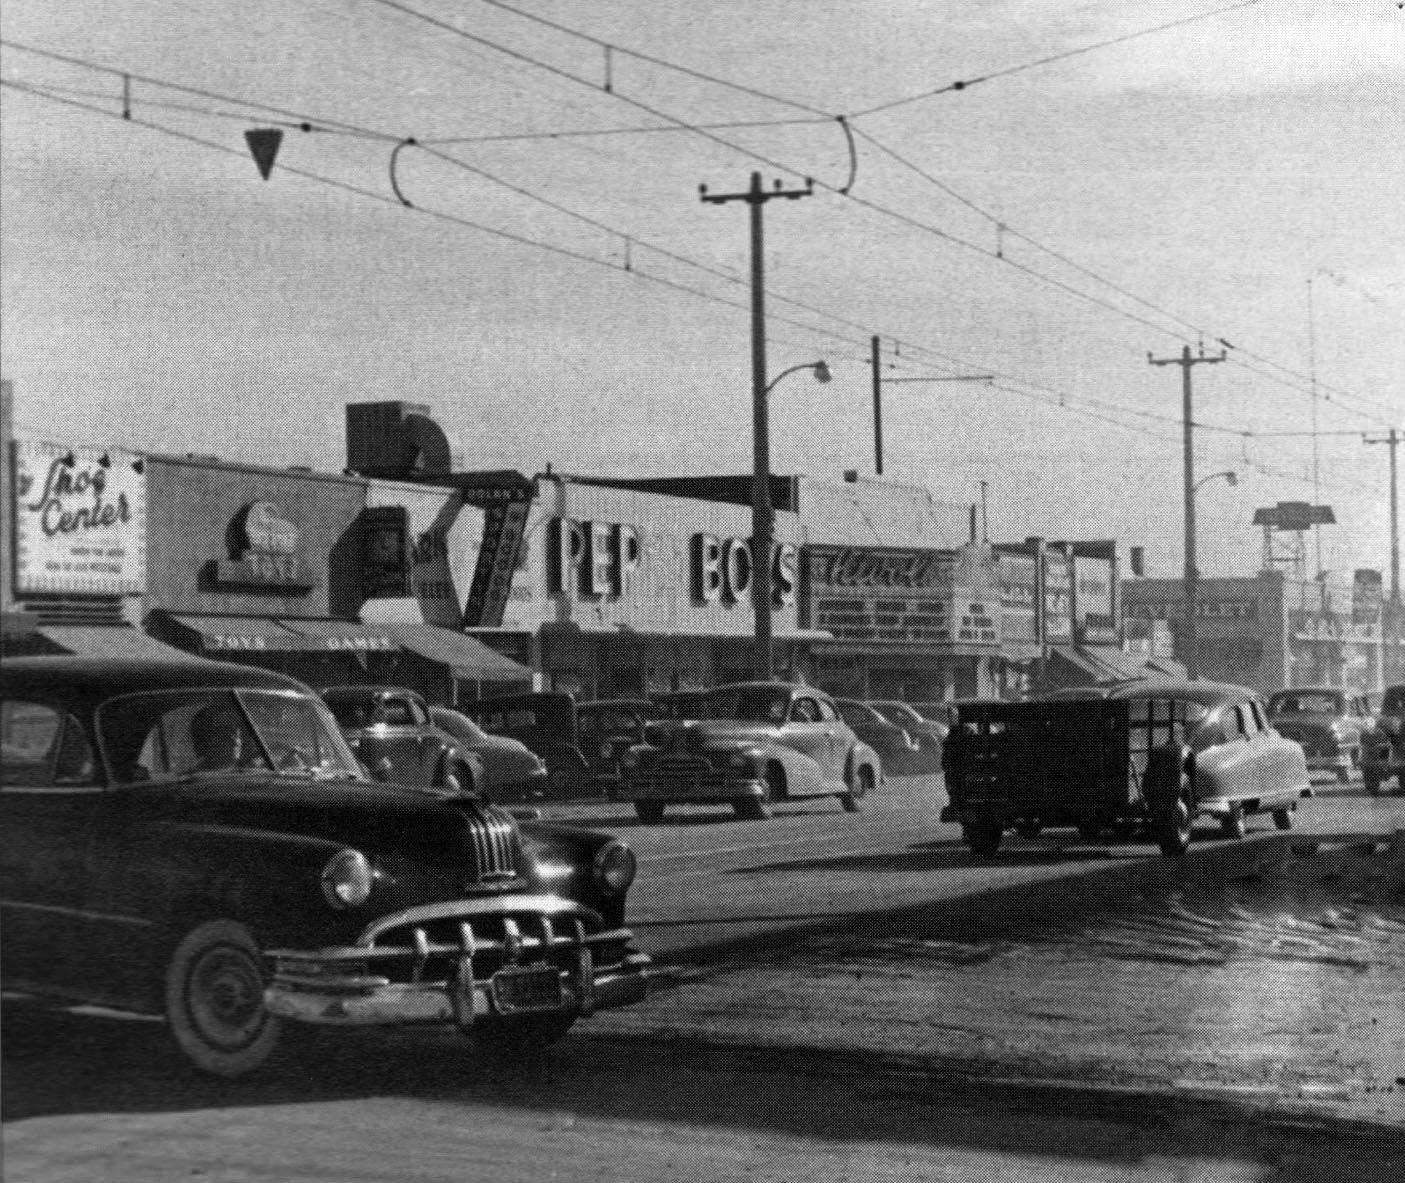 1952 Van Nuys Blvd San Fernando Valley How I Remember It